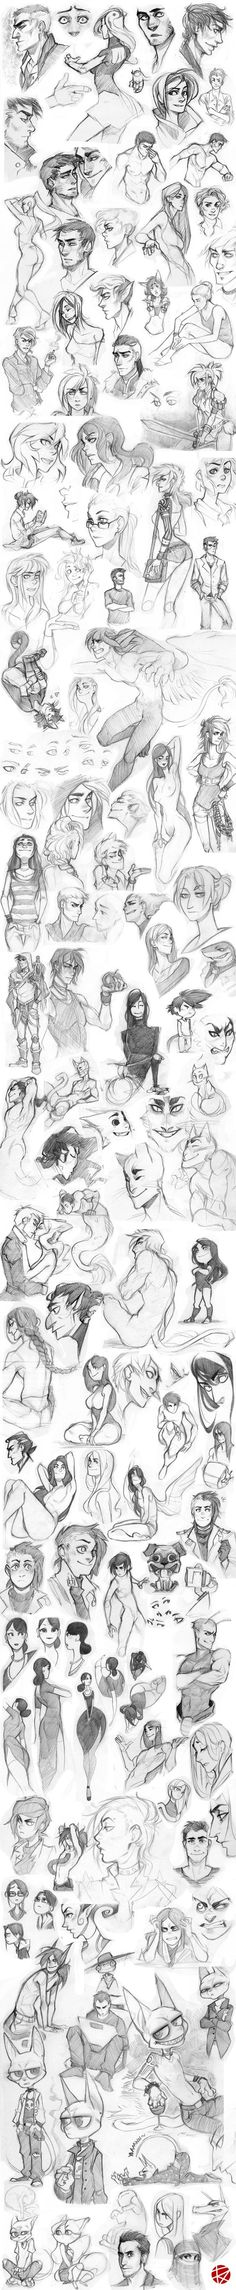 Sketch dump 01 by SylwiaPakulska.deviantart.com on @deviantART: